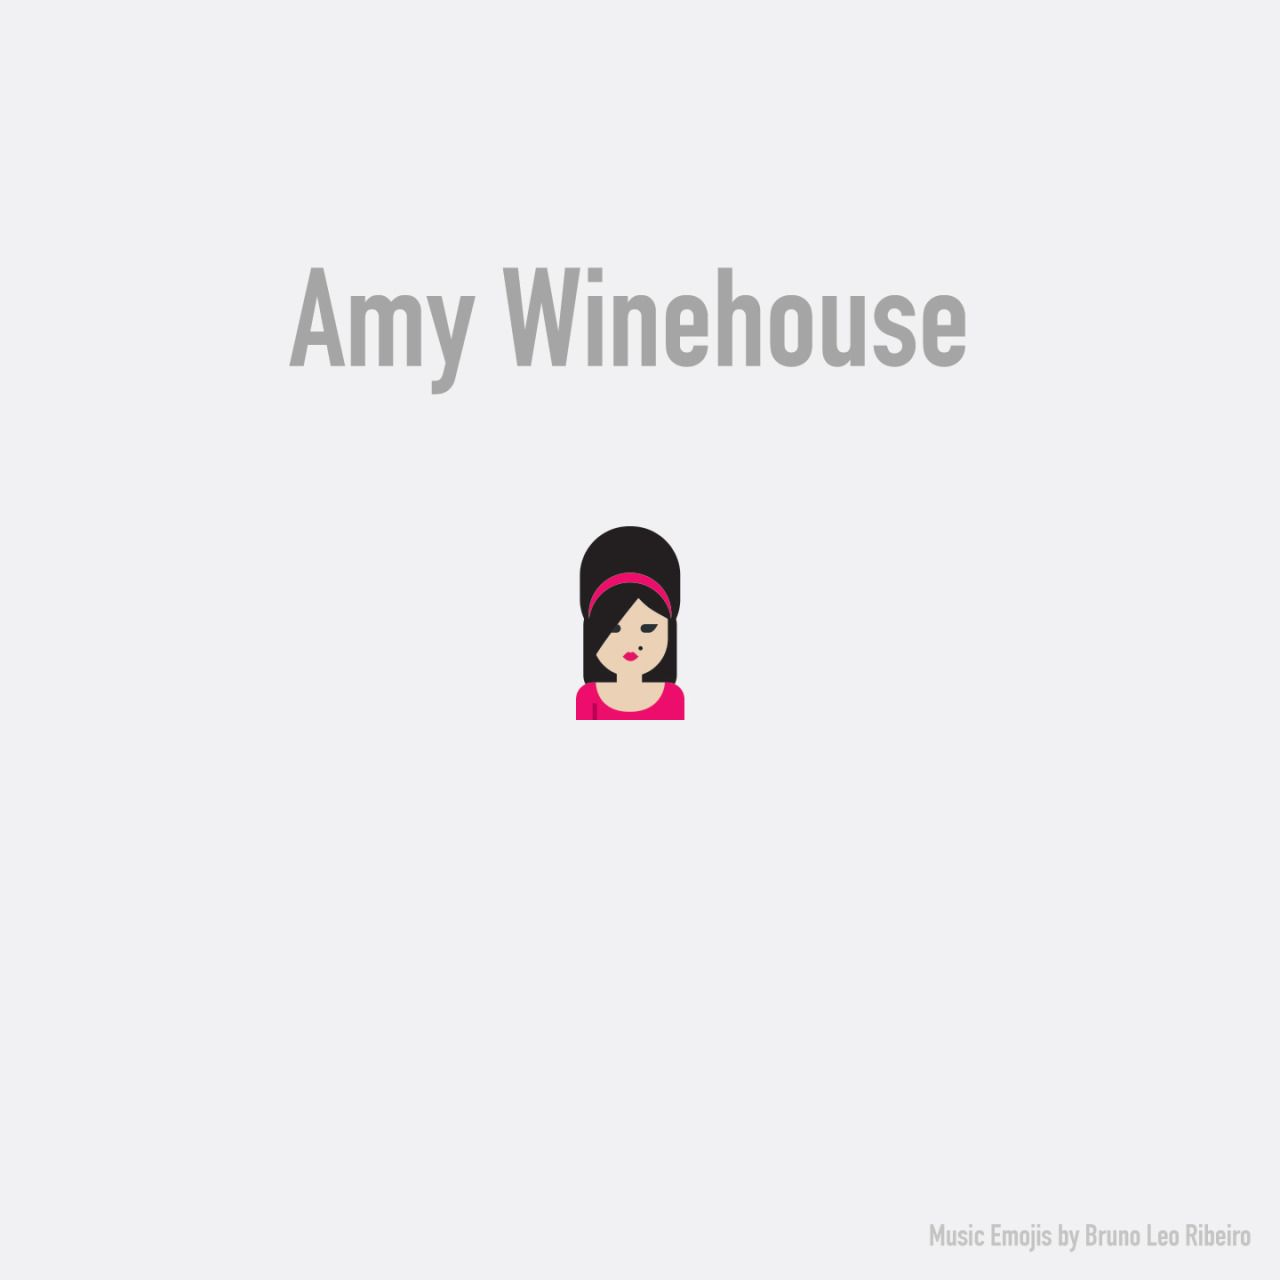 Character emoji symbols choice image symbol and sign ideas music emojis character design pinterest emojis flat music emojis buycottarizona buycottarizona